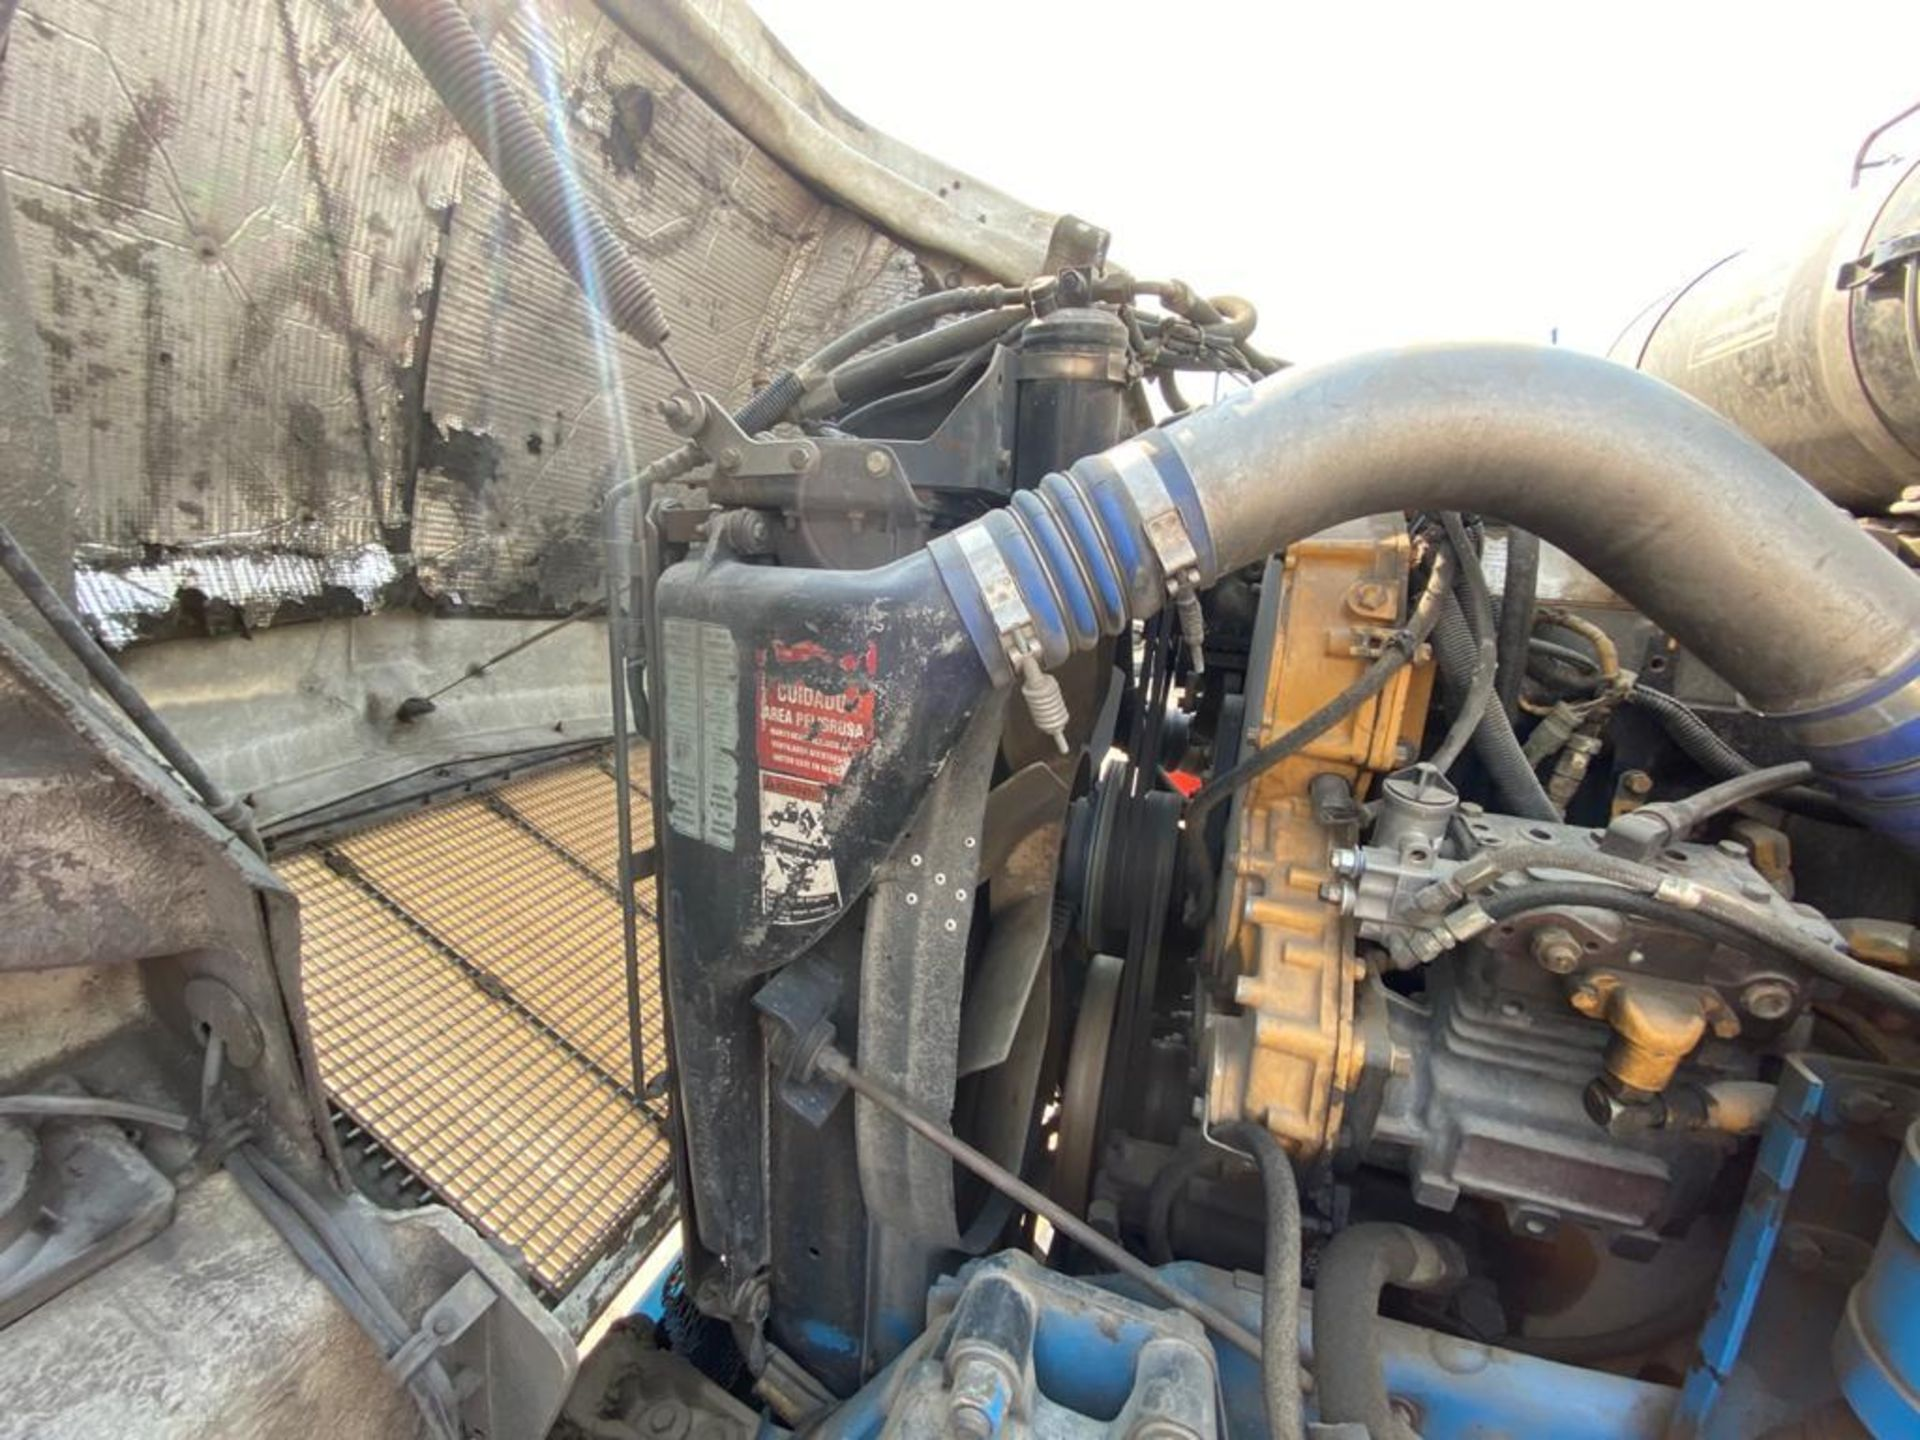 1998 Kenworth Sleeper truck tractor, standard transmission of 18 speeds - Image 69 of 75